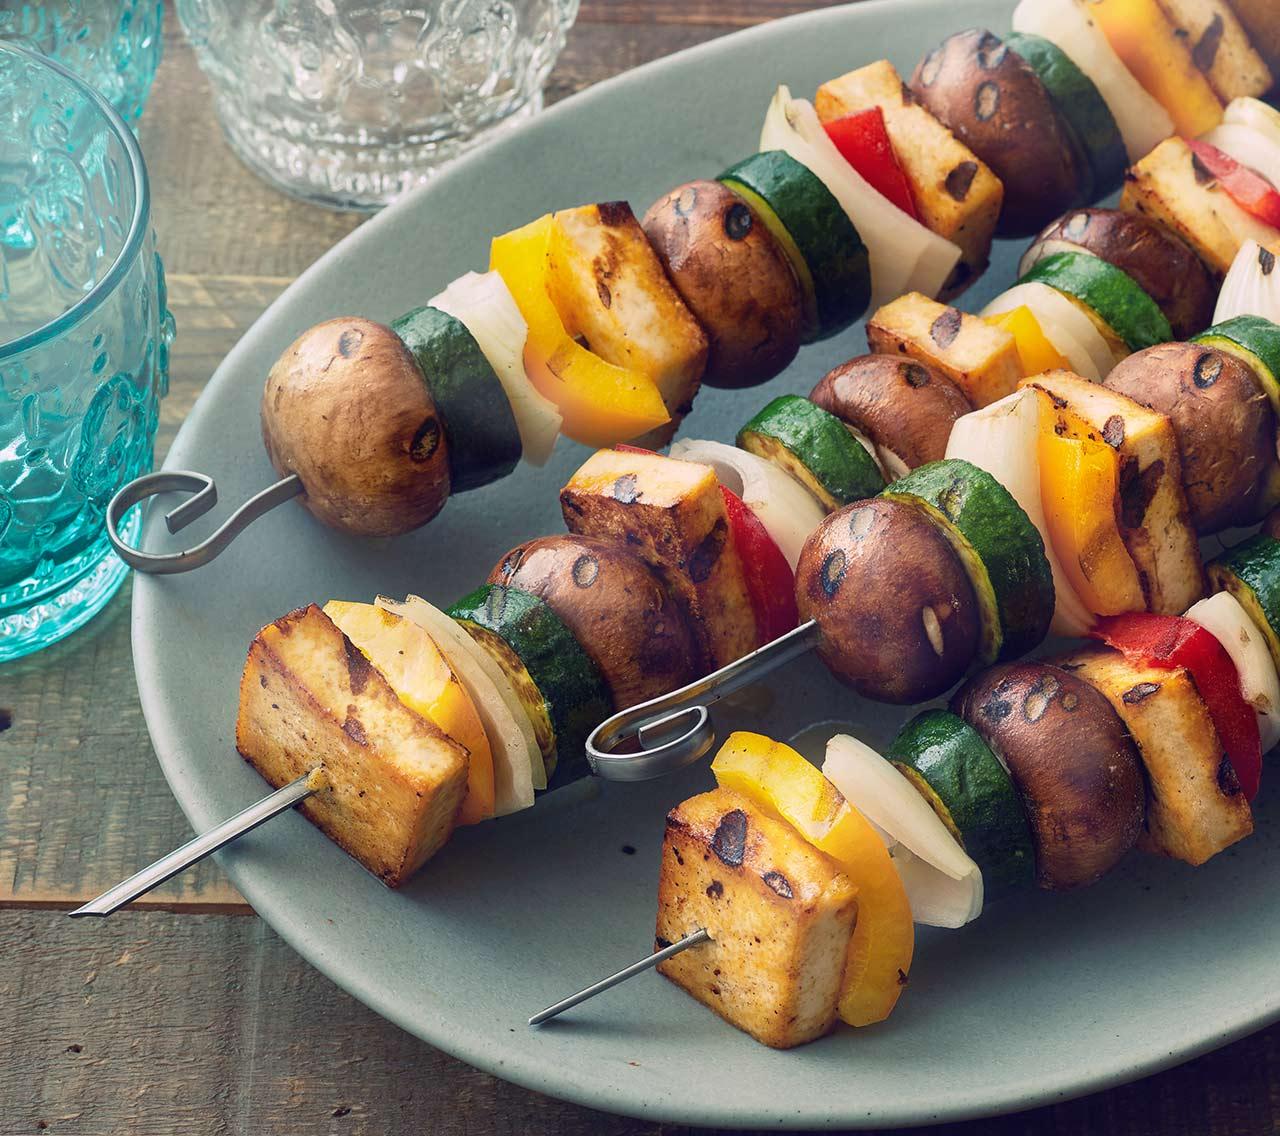 Lemon-Herb Grilled Tofu & Veggie Kabobs